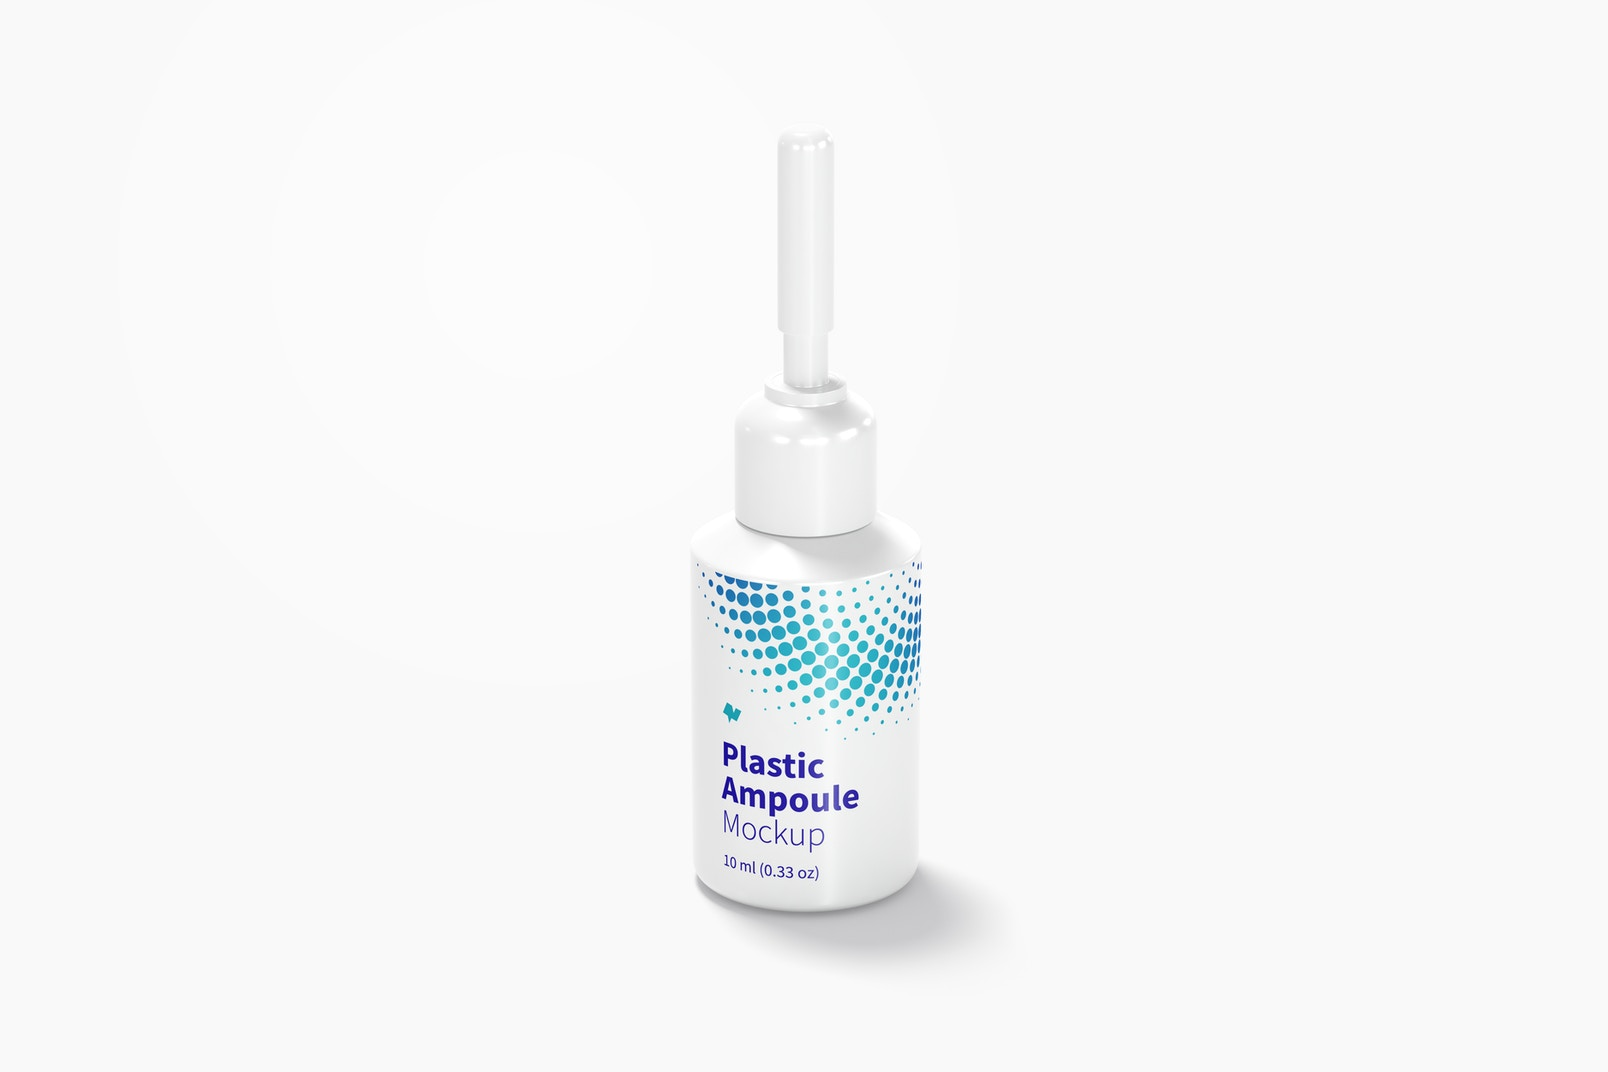 10 ml Plastic Ampoule Mockup